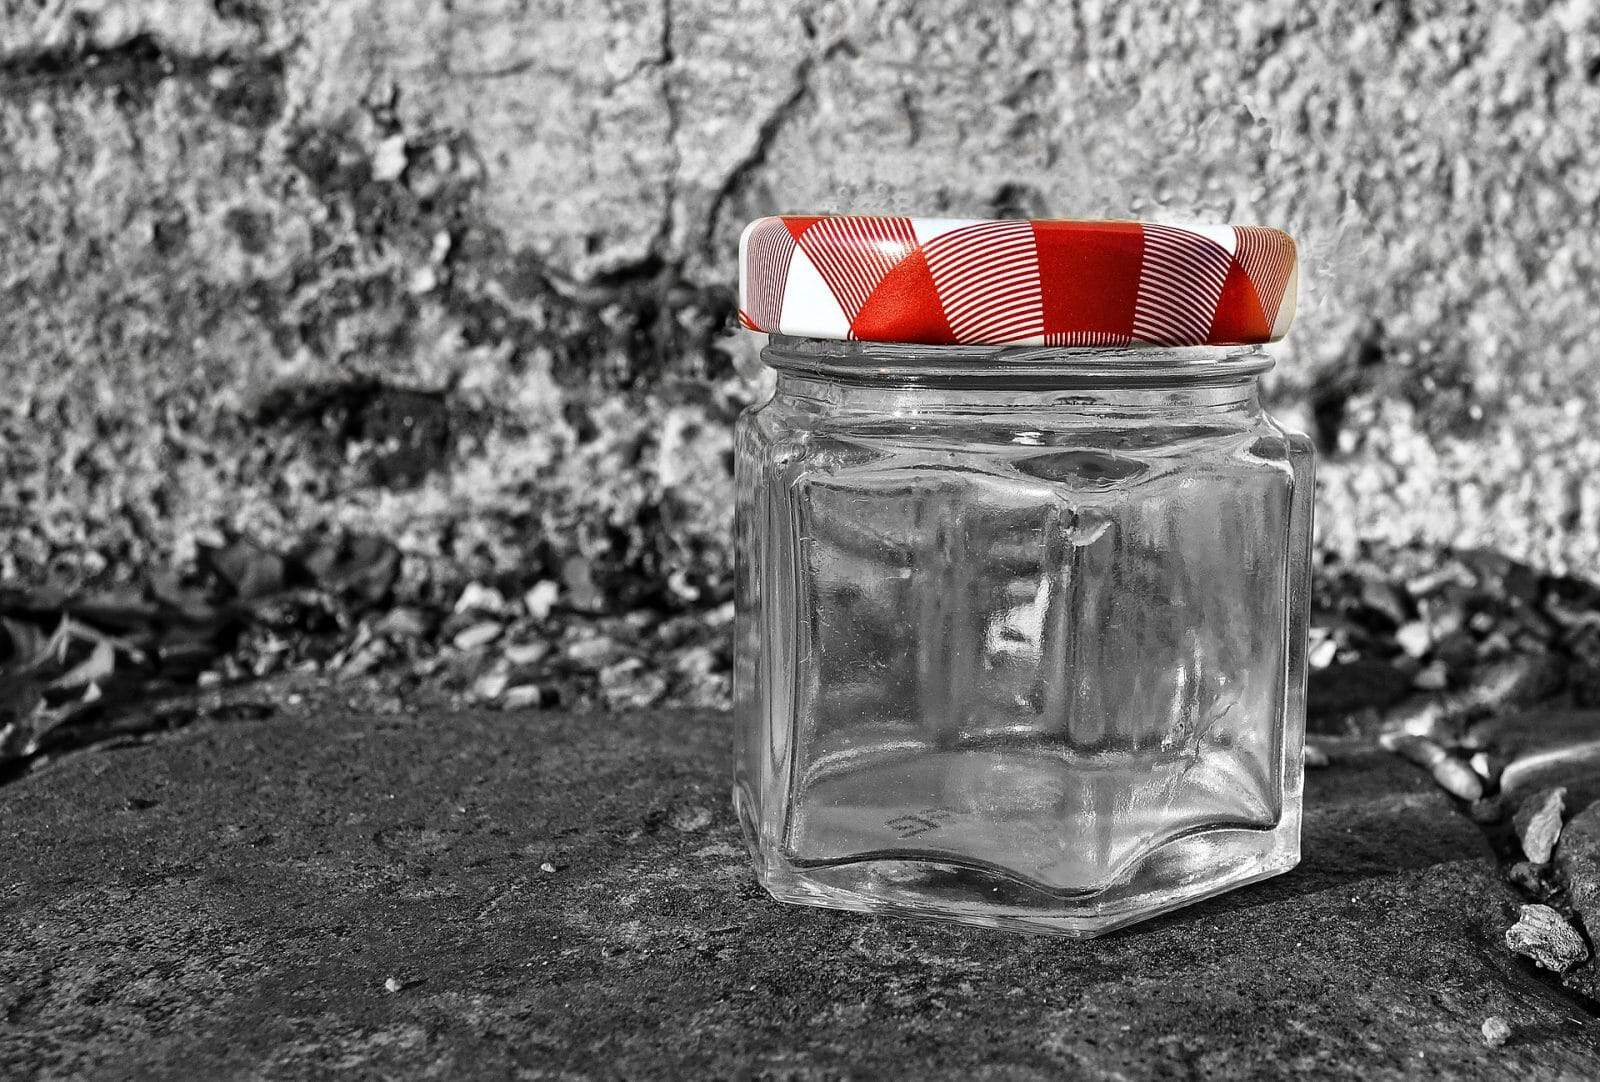 hexagonal glass jar for canning peaches